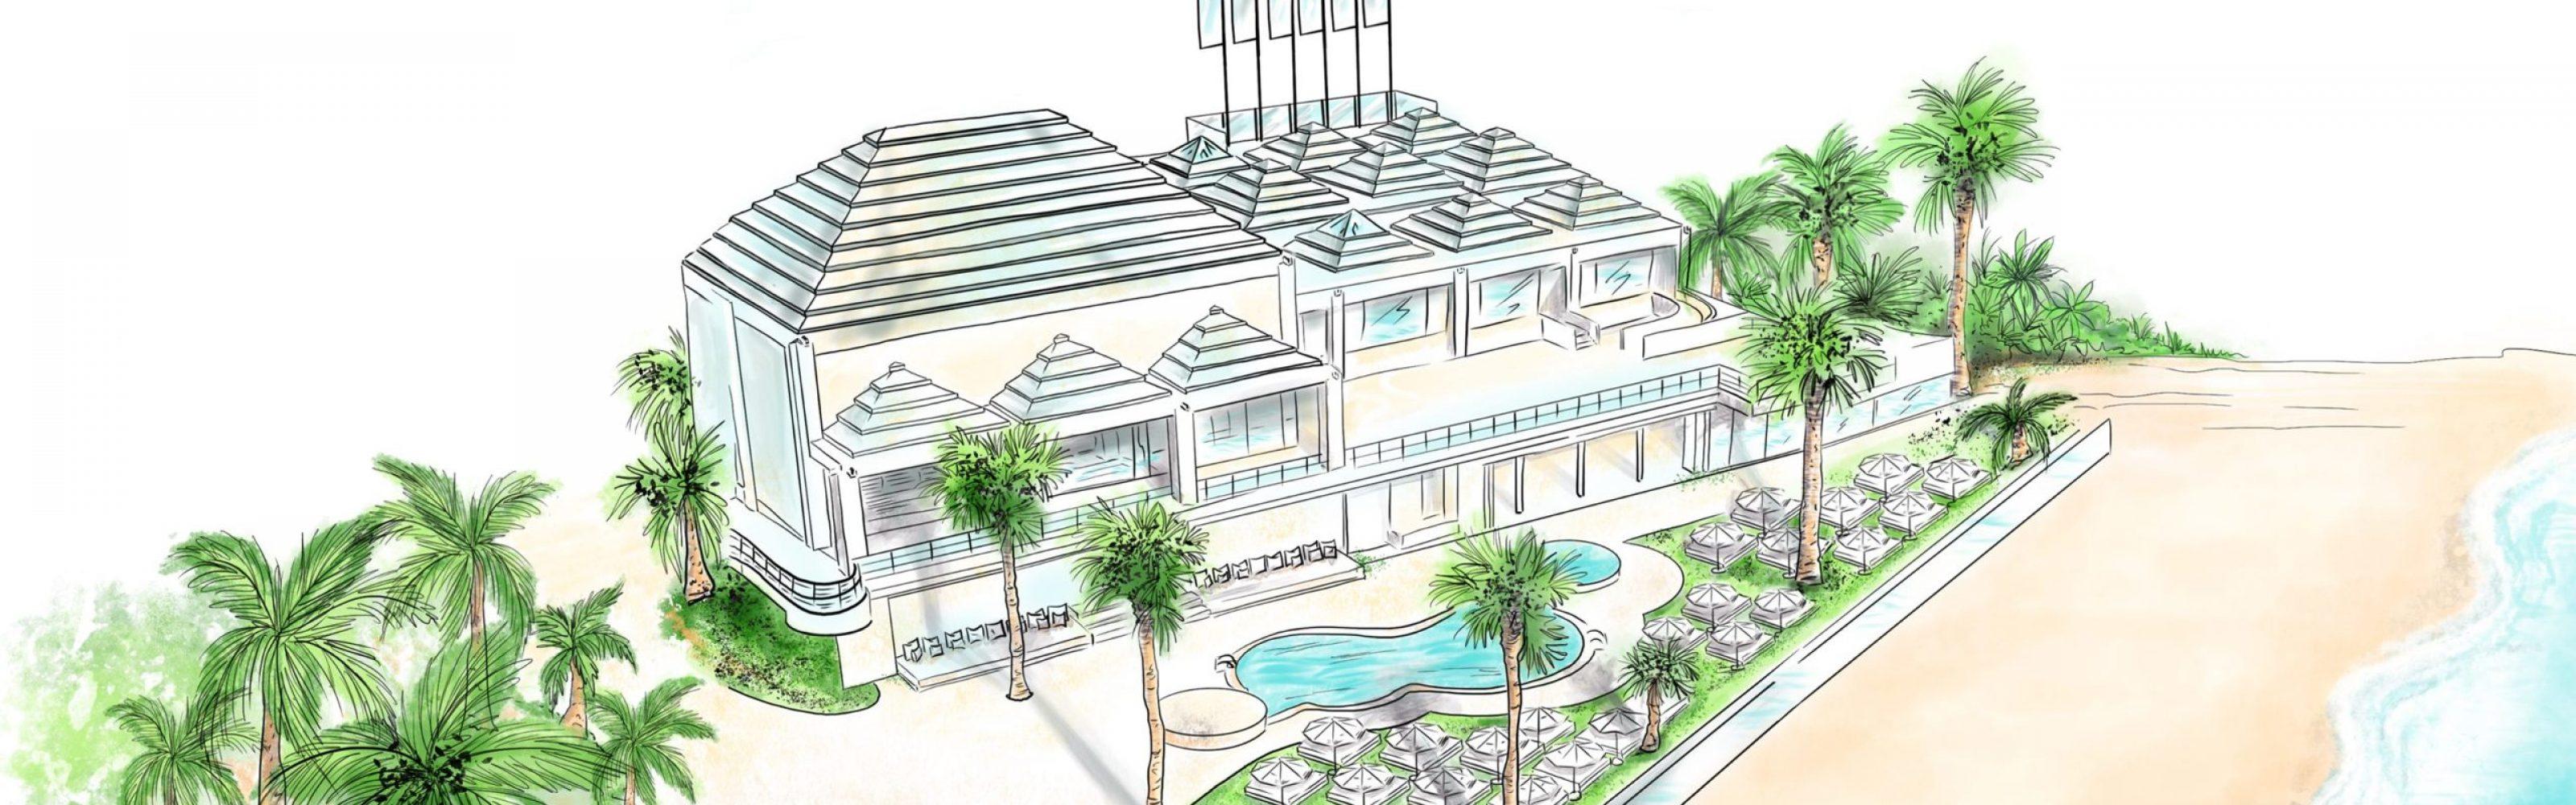 FLORIDA-BEACH-DIBUJO